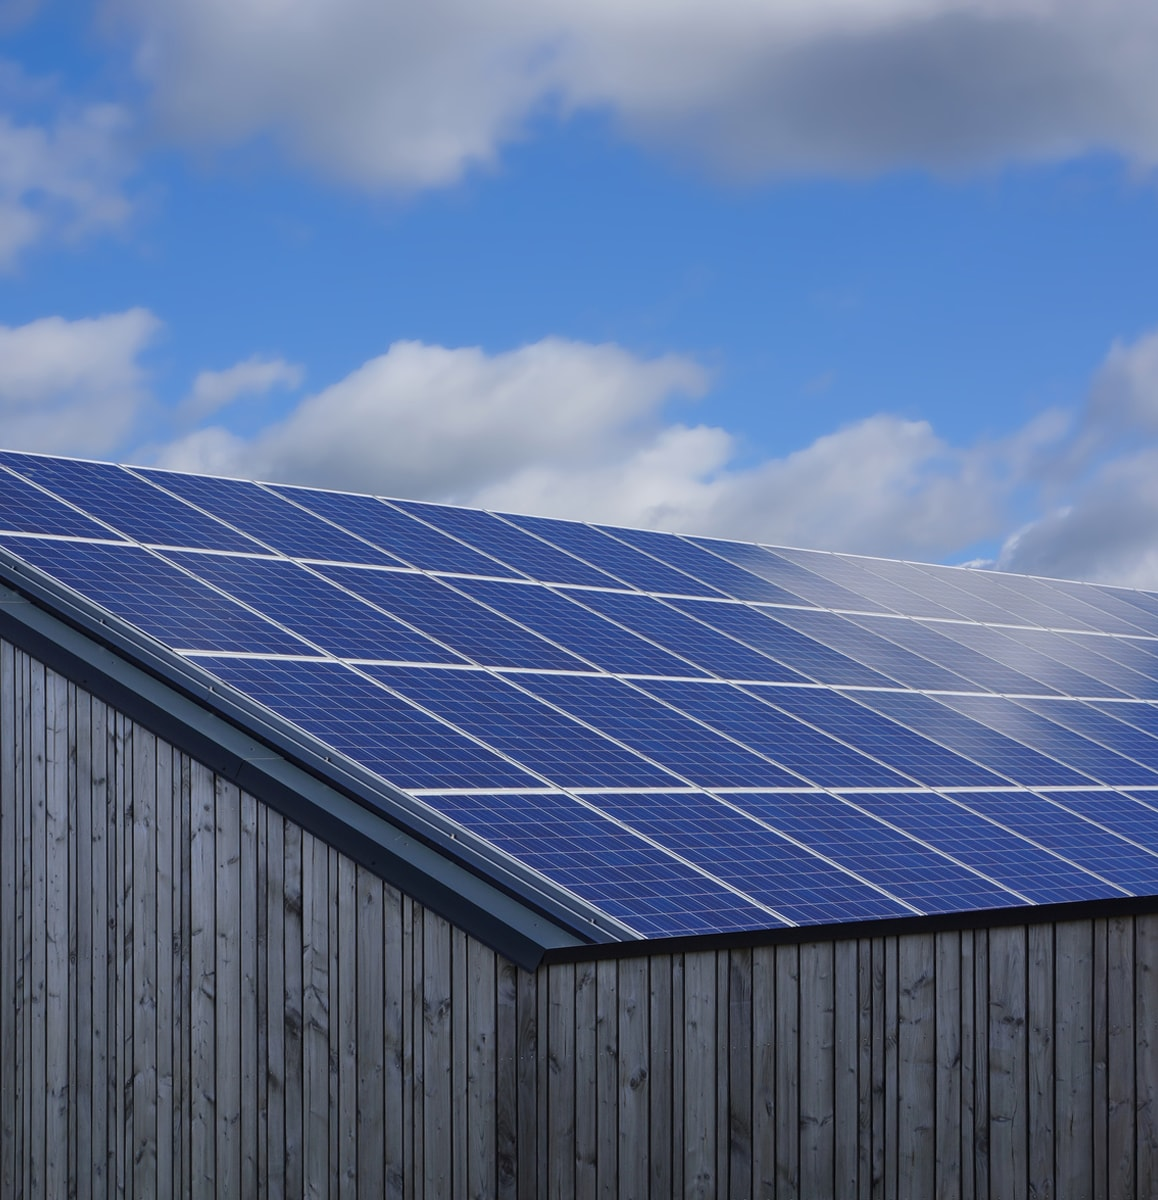 Maison my ihome myihome - Maison autonome energetiquement ...